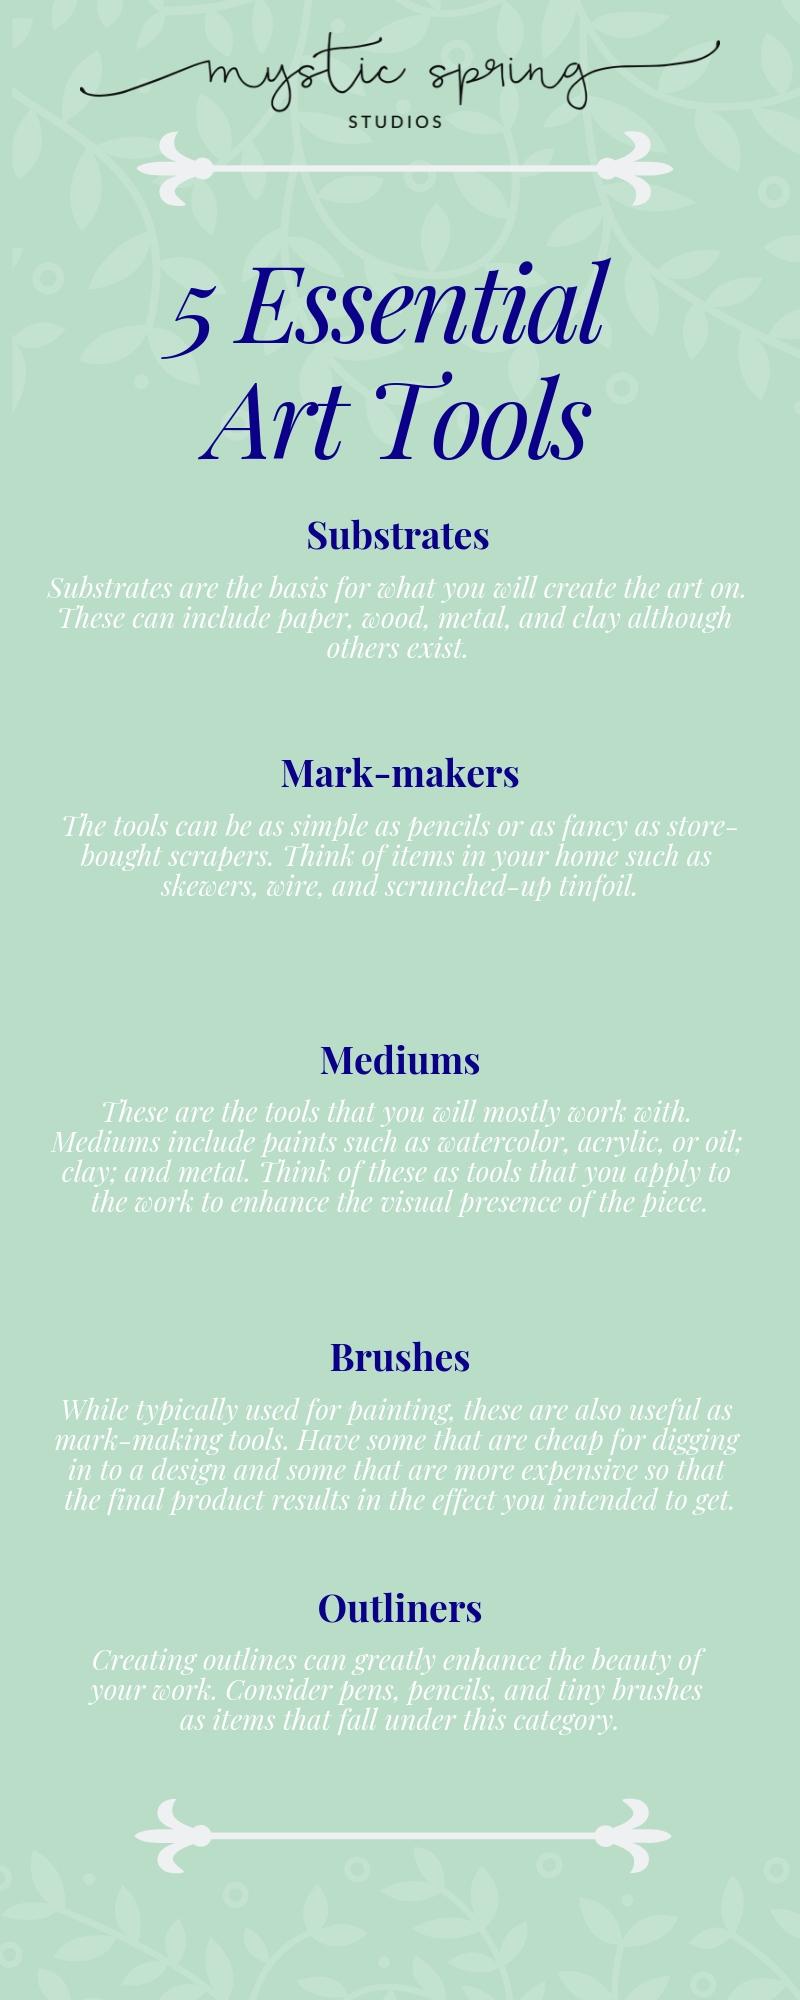 5 Essential Art Tools.jpg